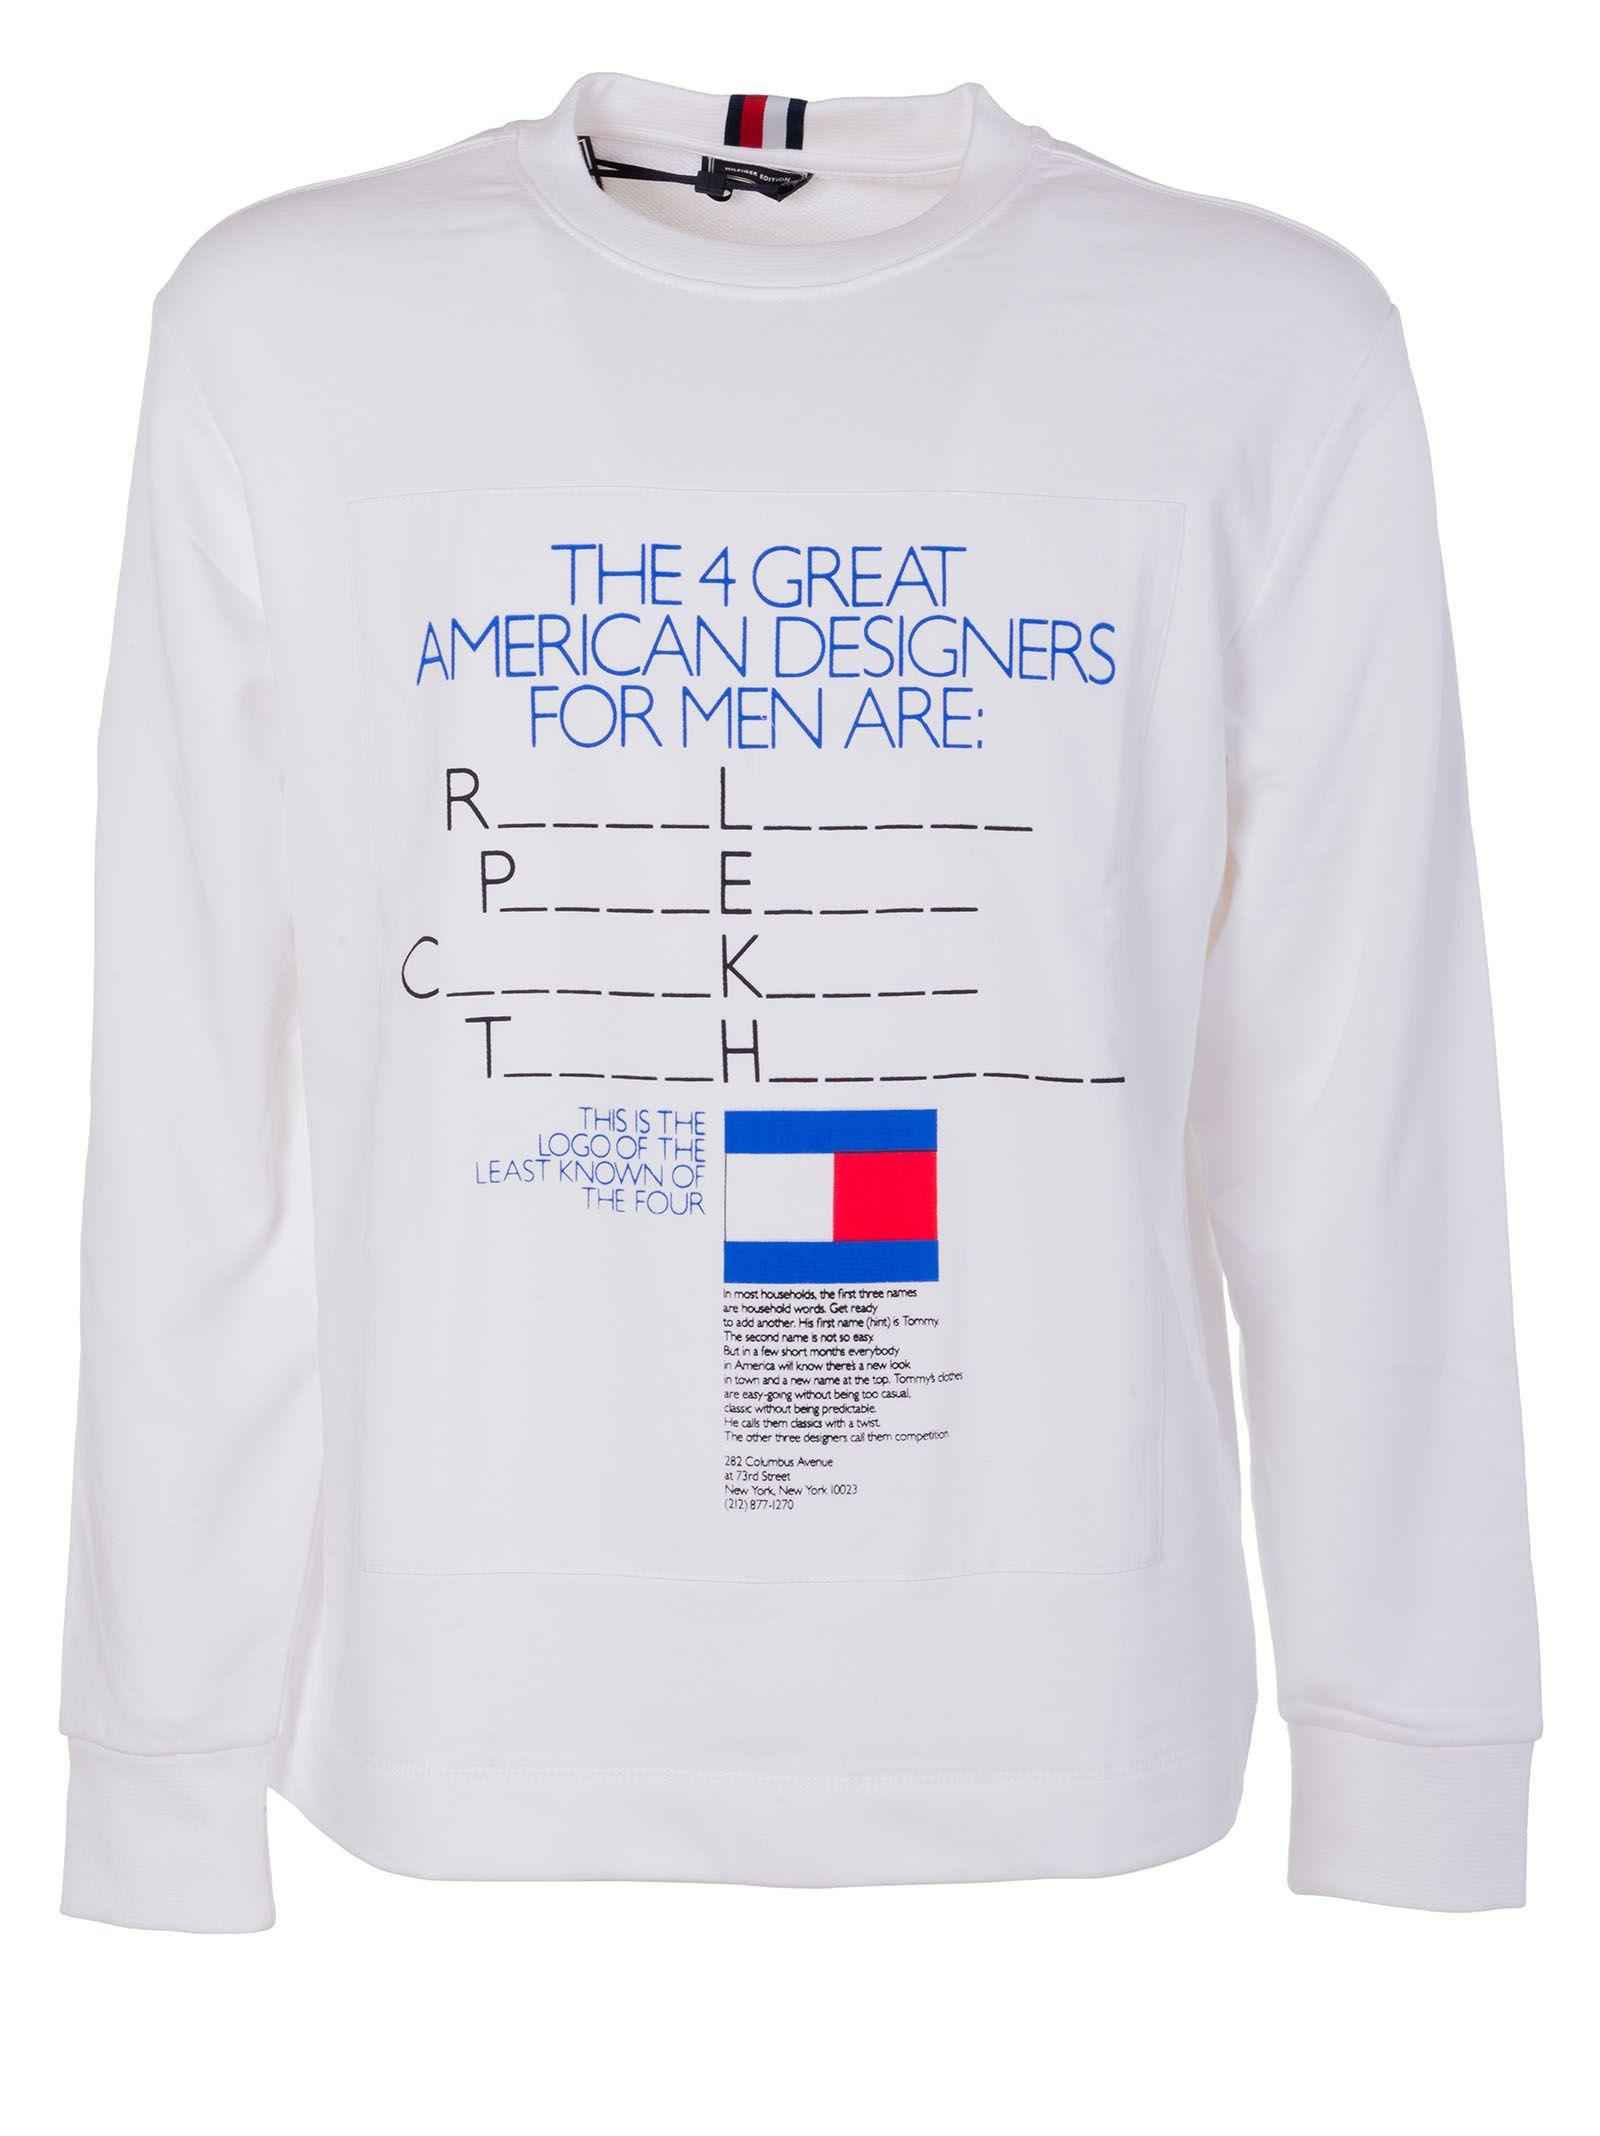 Tommy Hilfiger Ad Campaign Sweatshirt